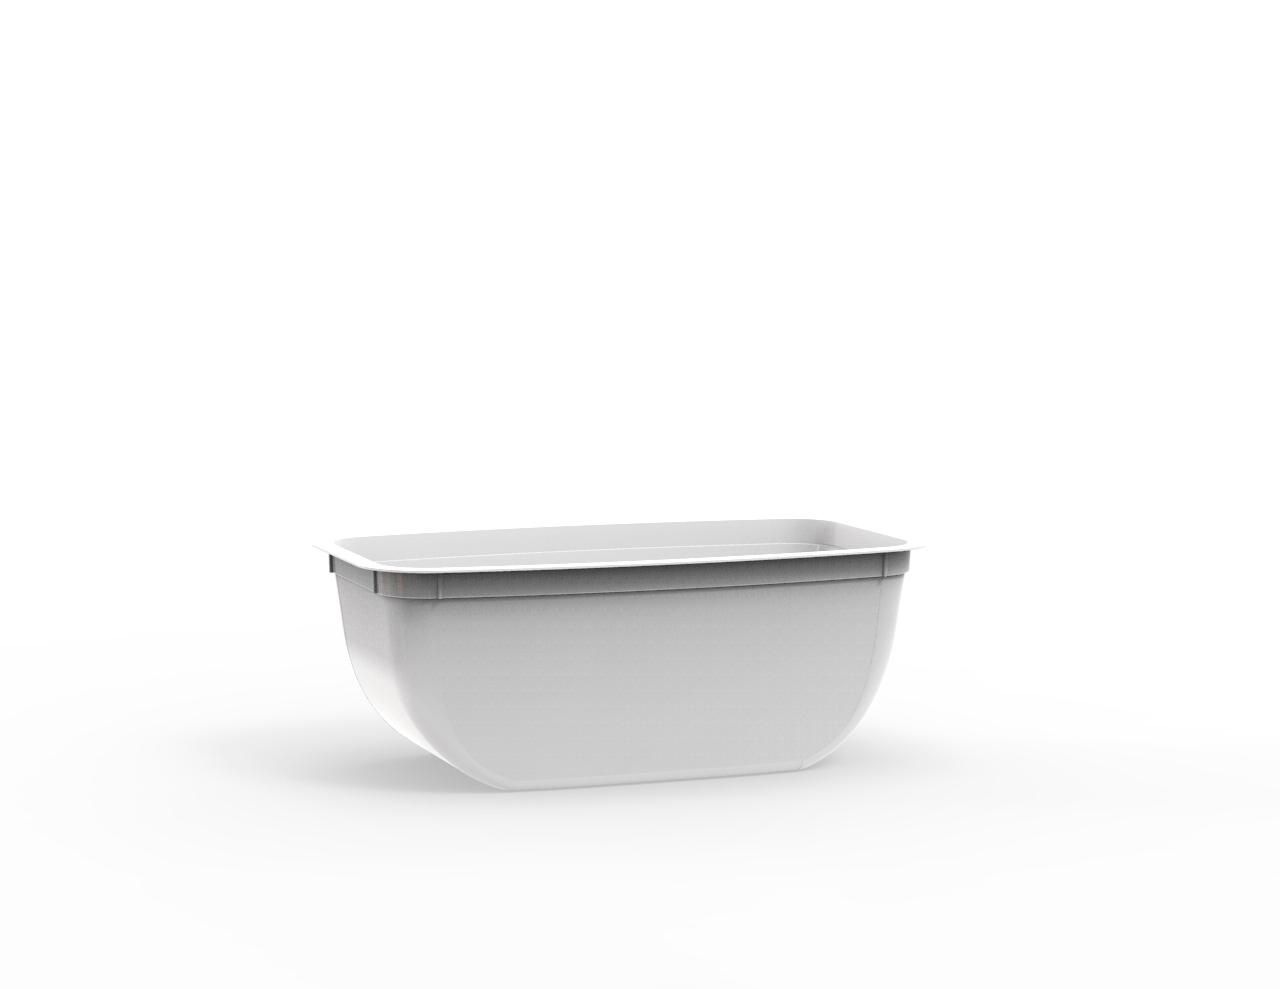 Beurrier operculable blanc 310 cm3